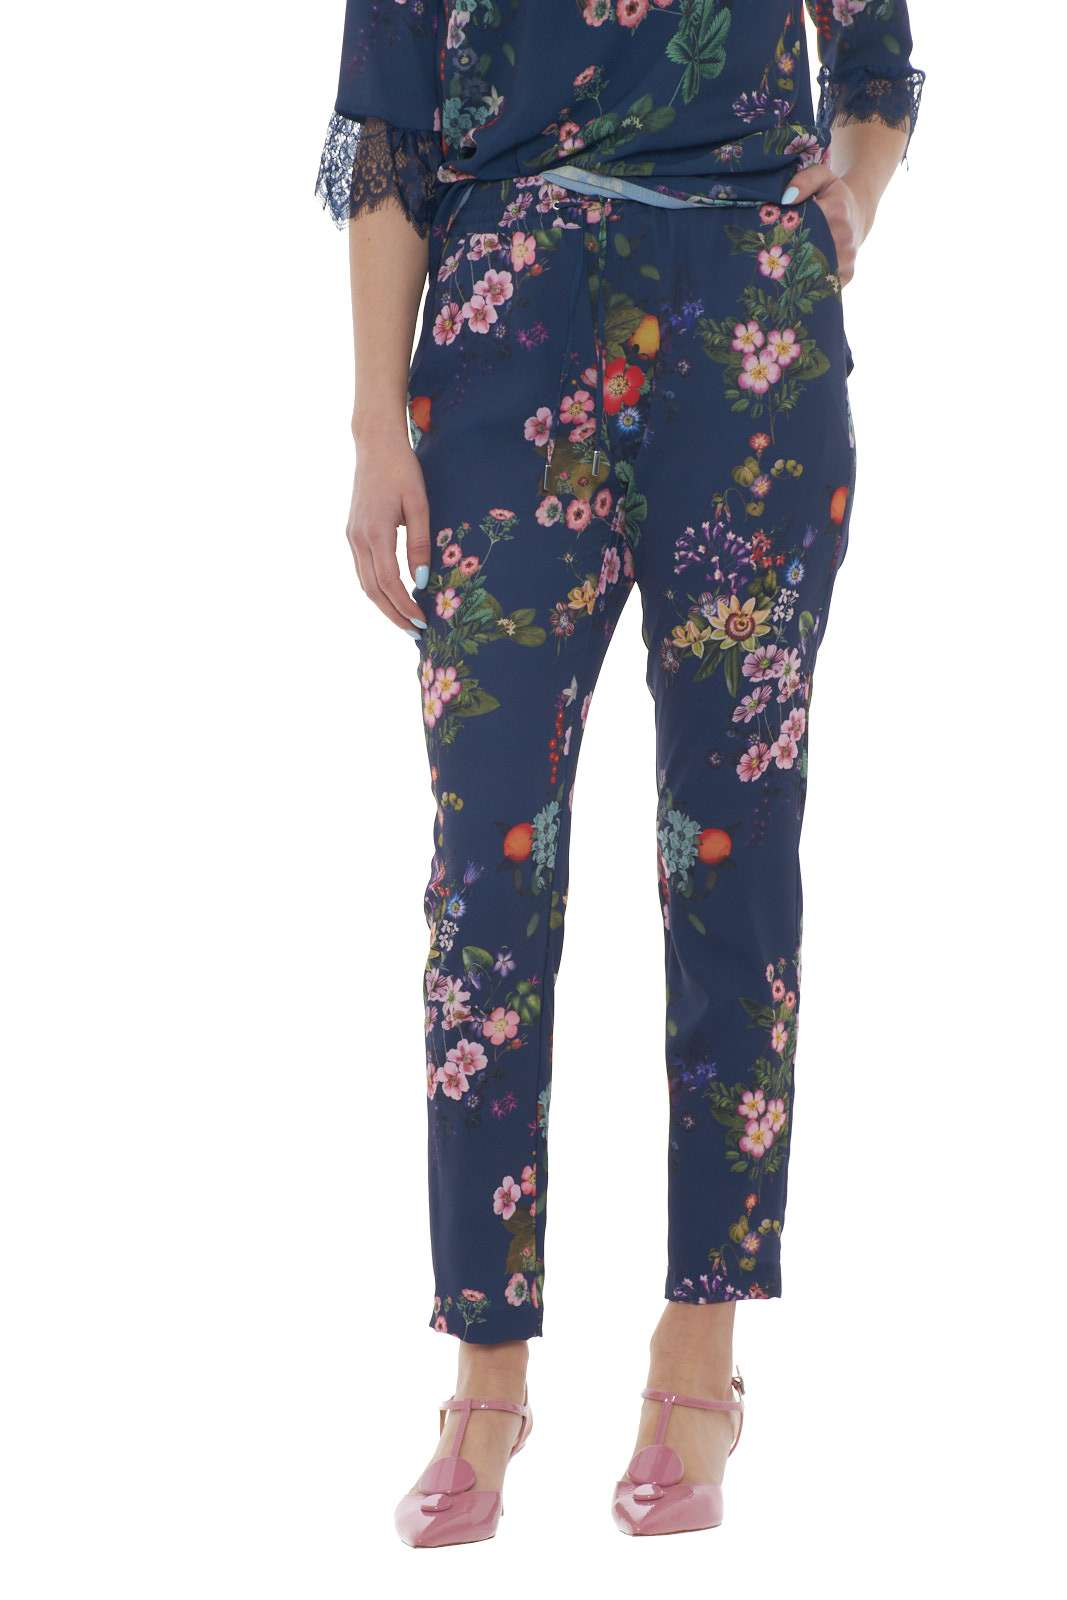 https://www.parmax.com/media/catalog/product/a/i/PE-outlet_parmax-pantaloni-donna-Liu-Jo-w19280-A.jpg